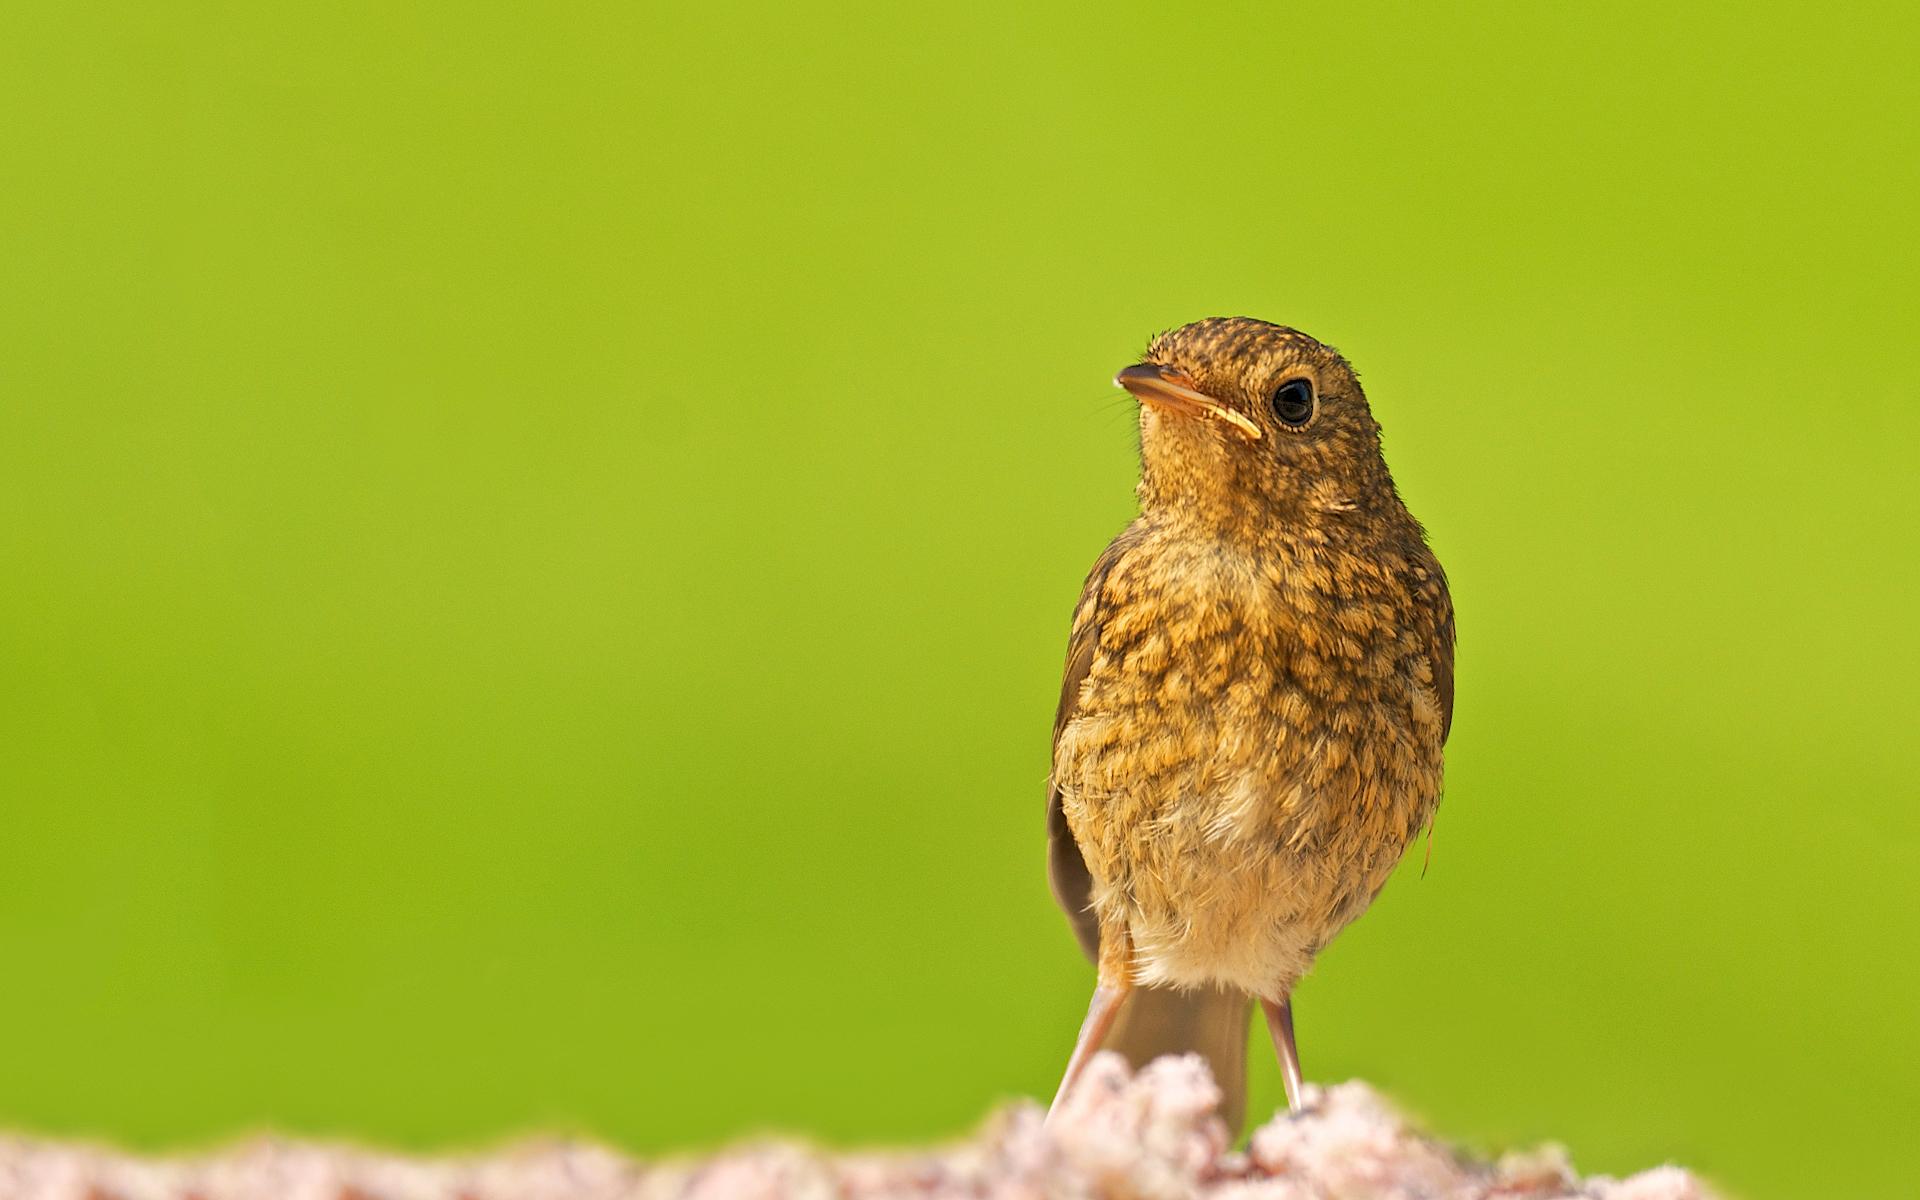 robin bird images